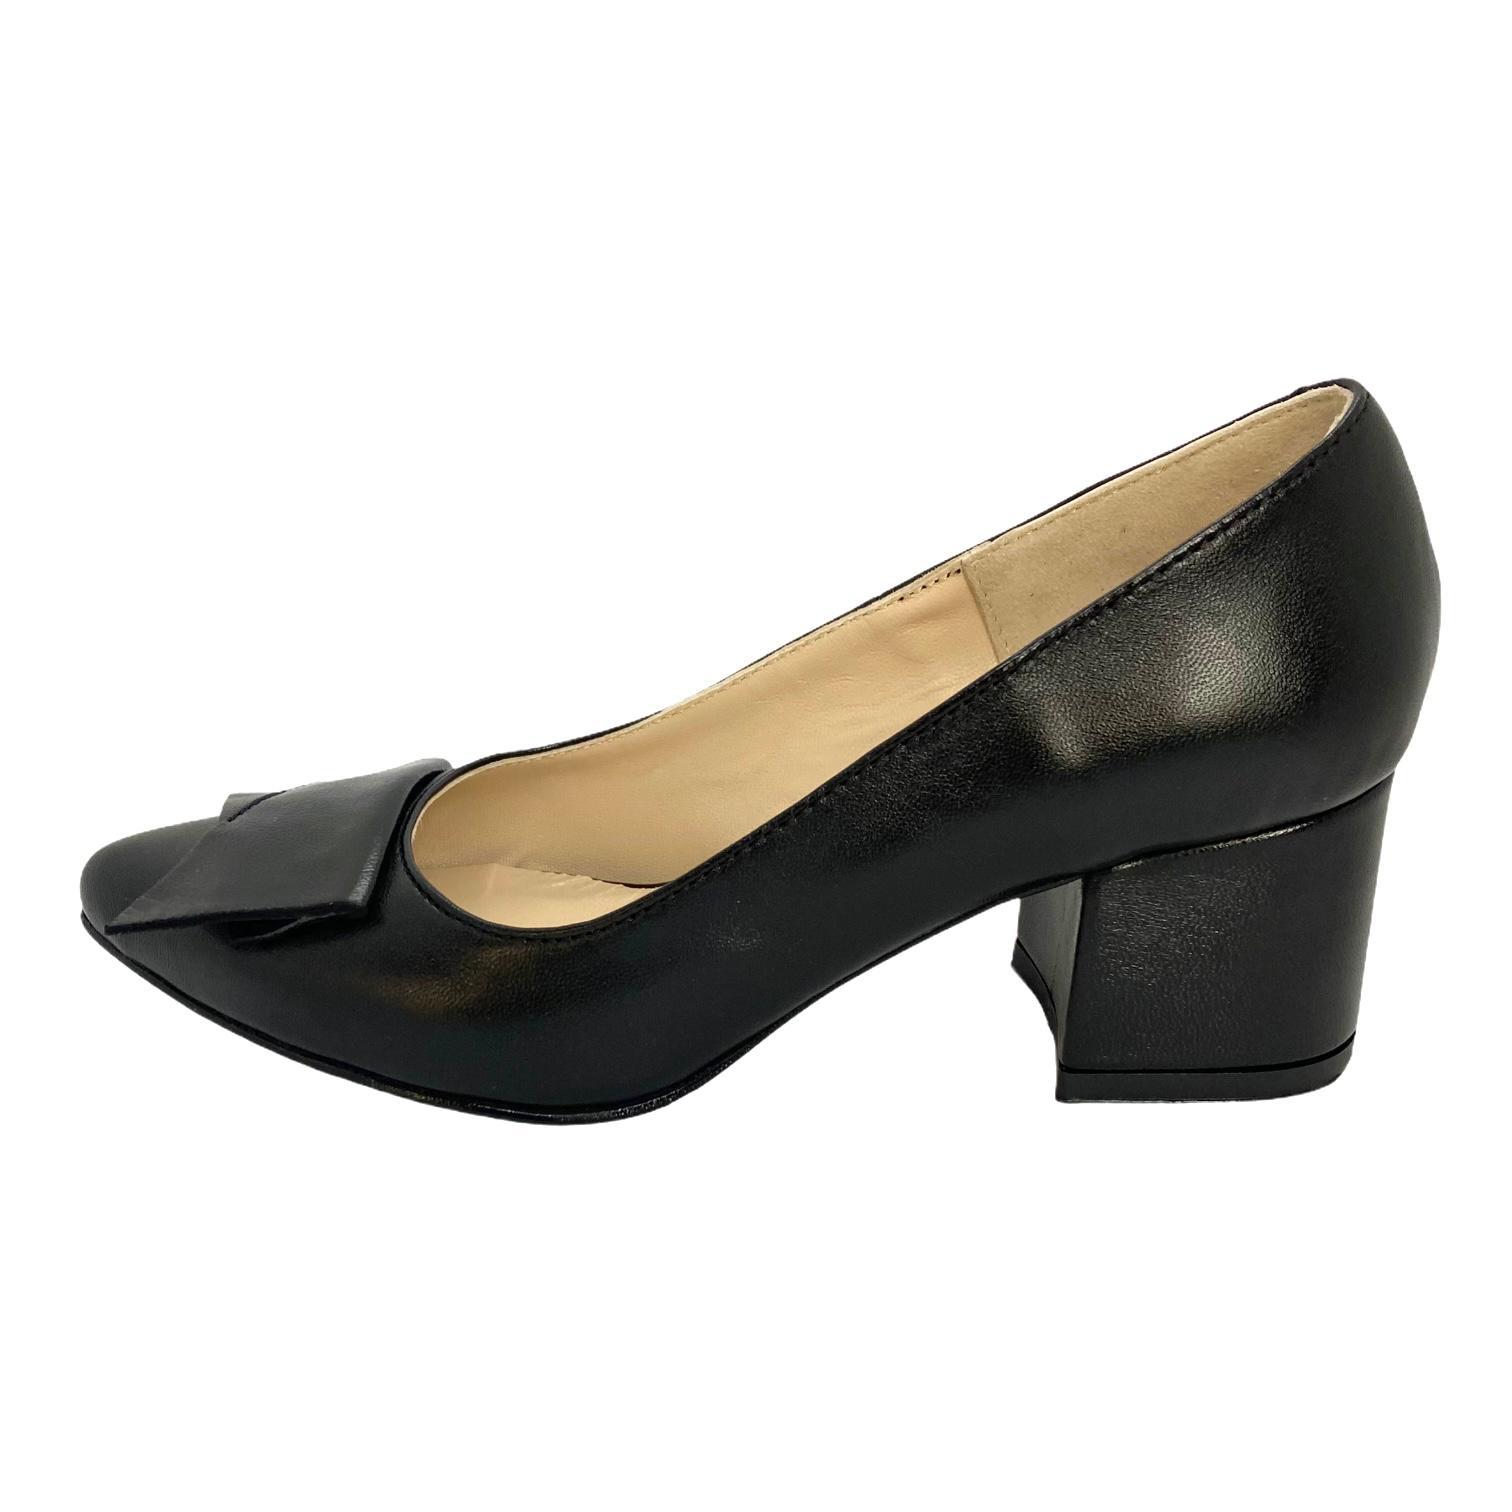 Pantofi negri cu accesoriu din piele